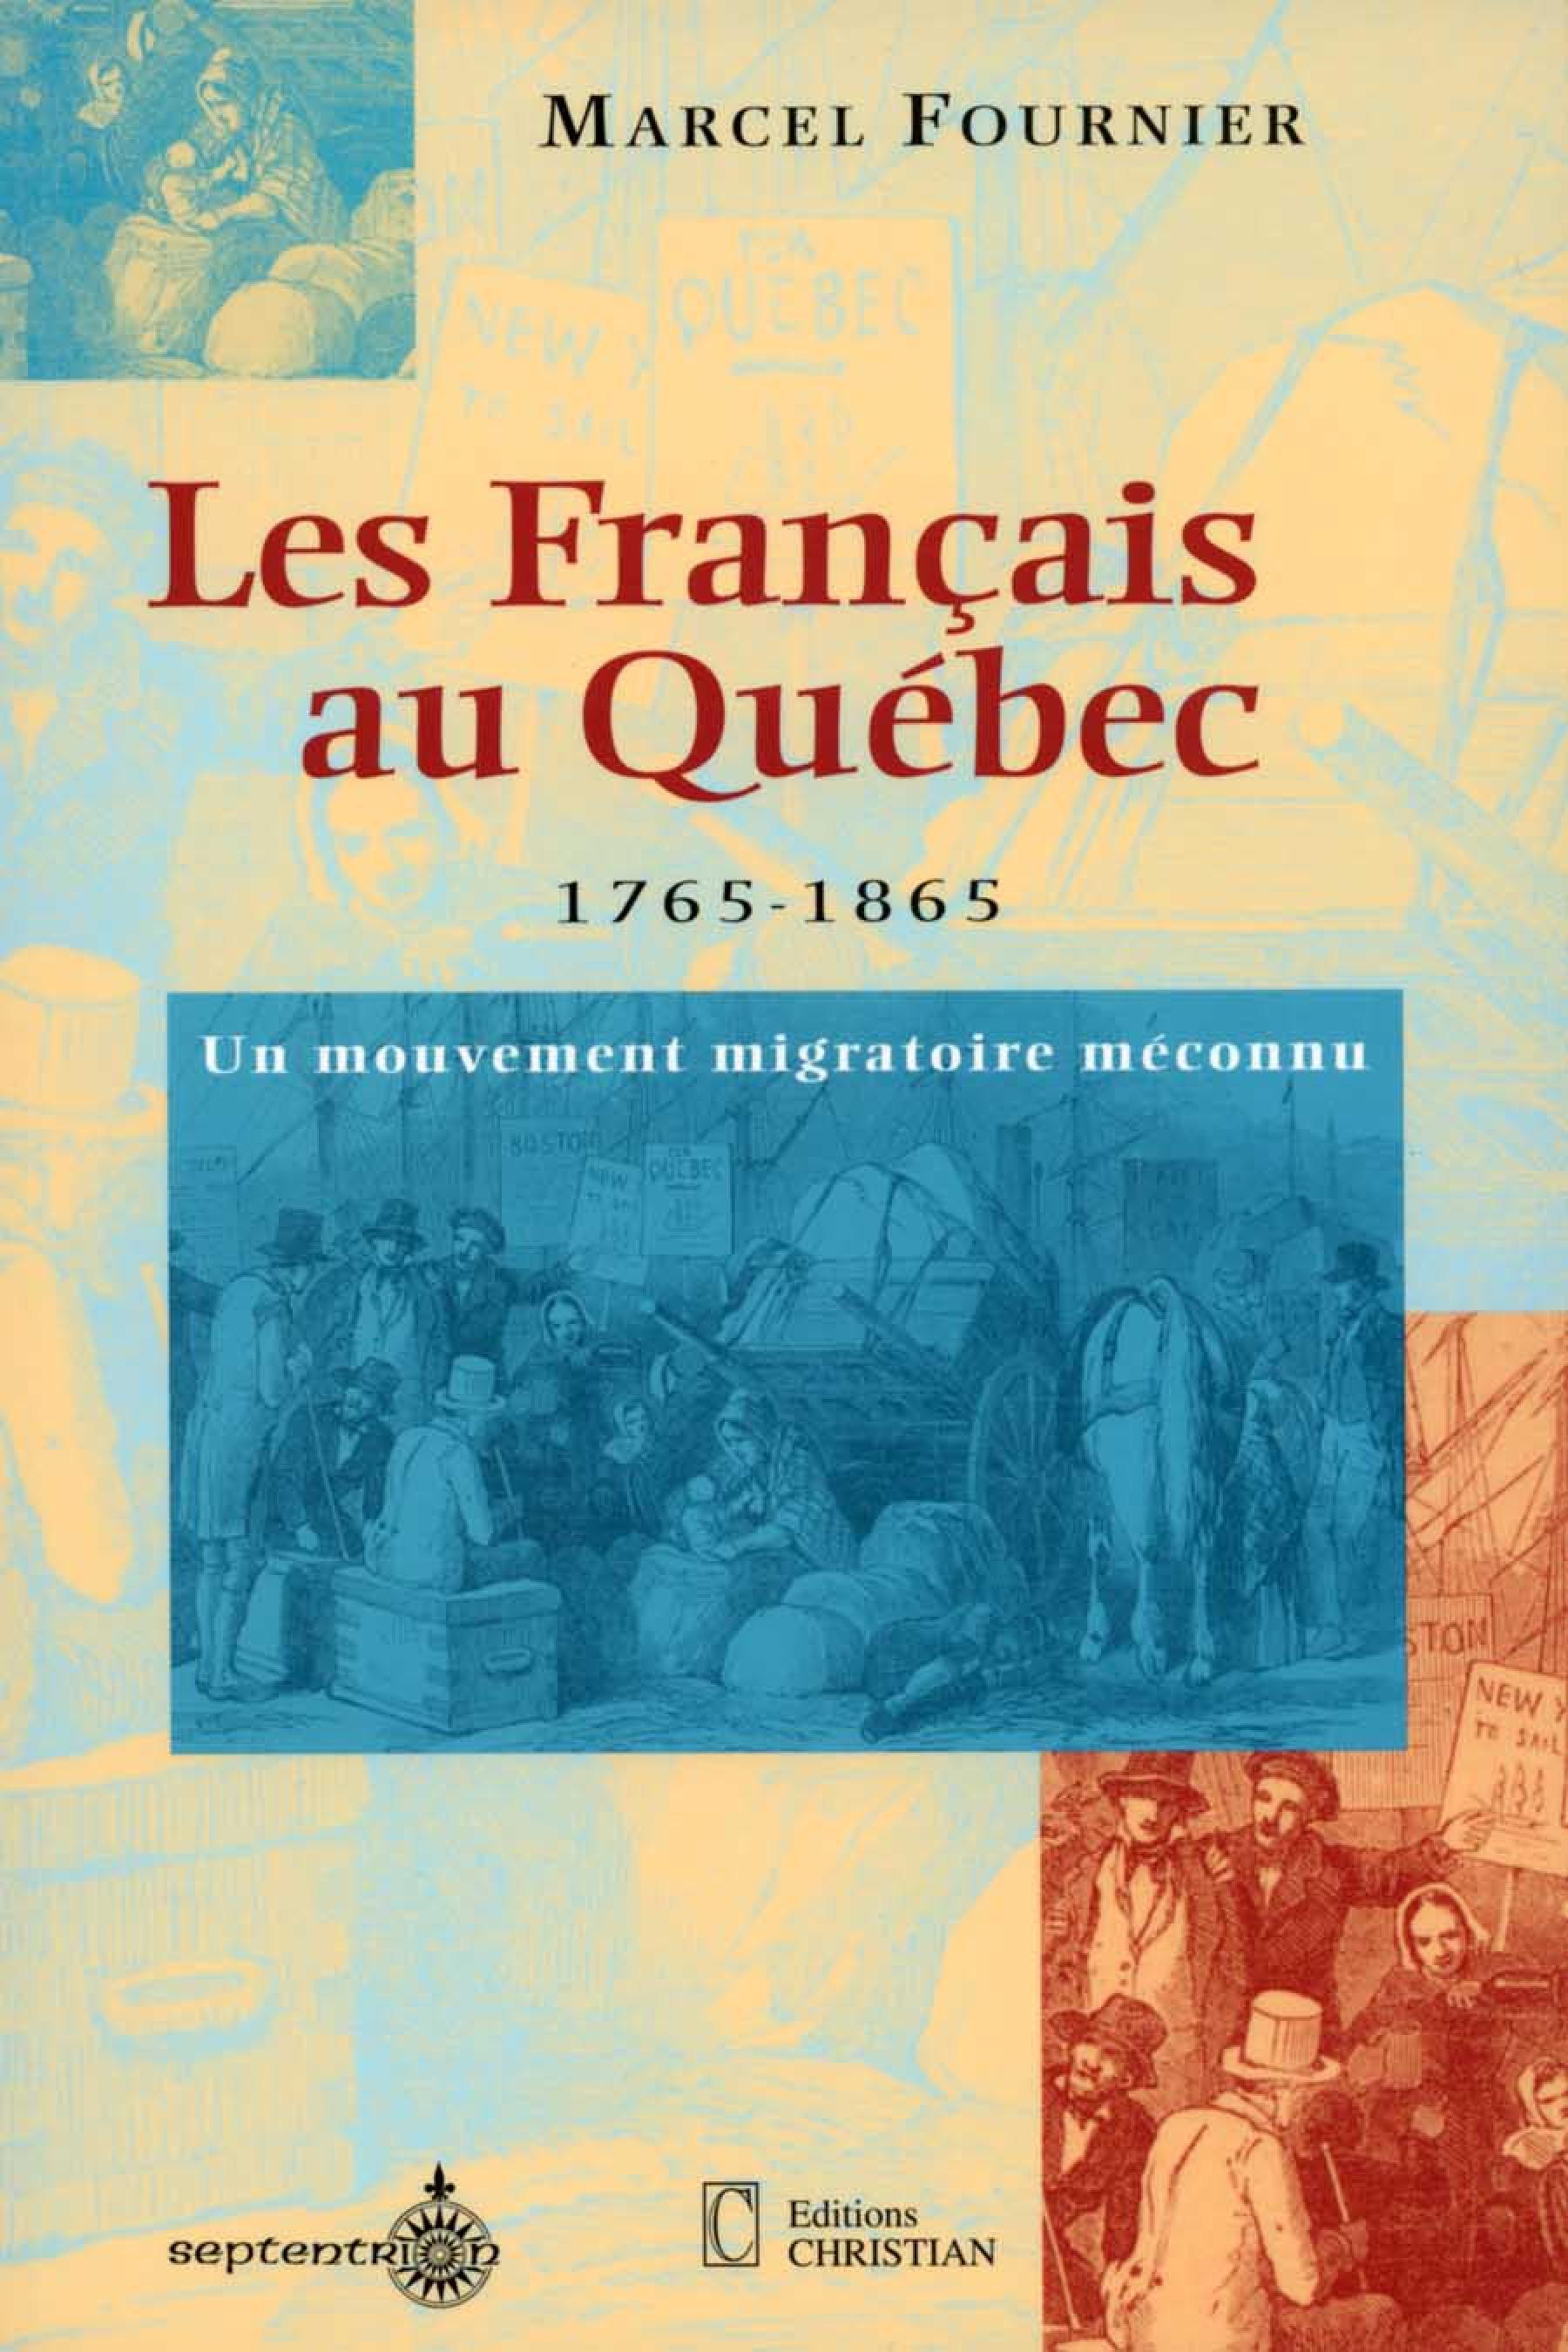 Les Français au Québec, 1765-1865